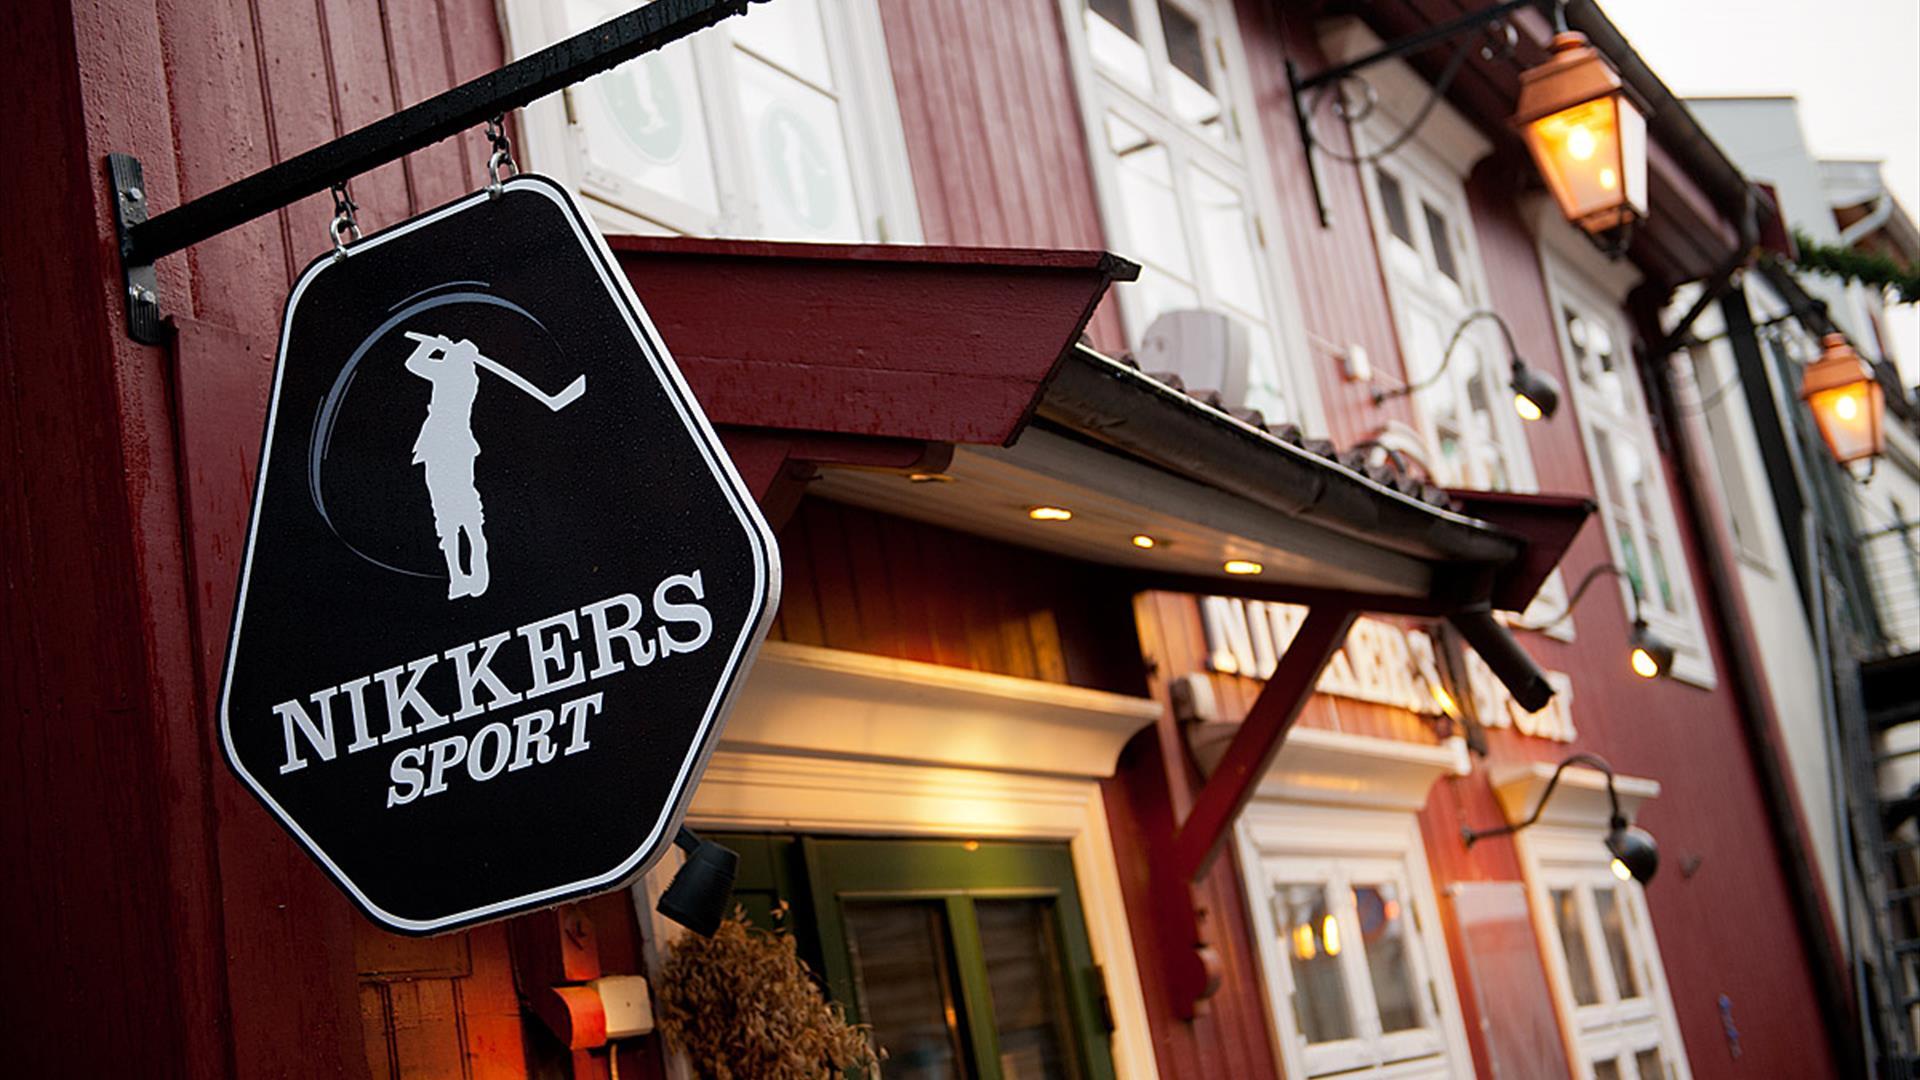 Inngangspartiet og skiltet til Nikkers Sport